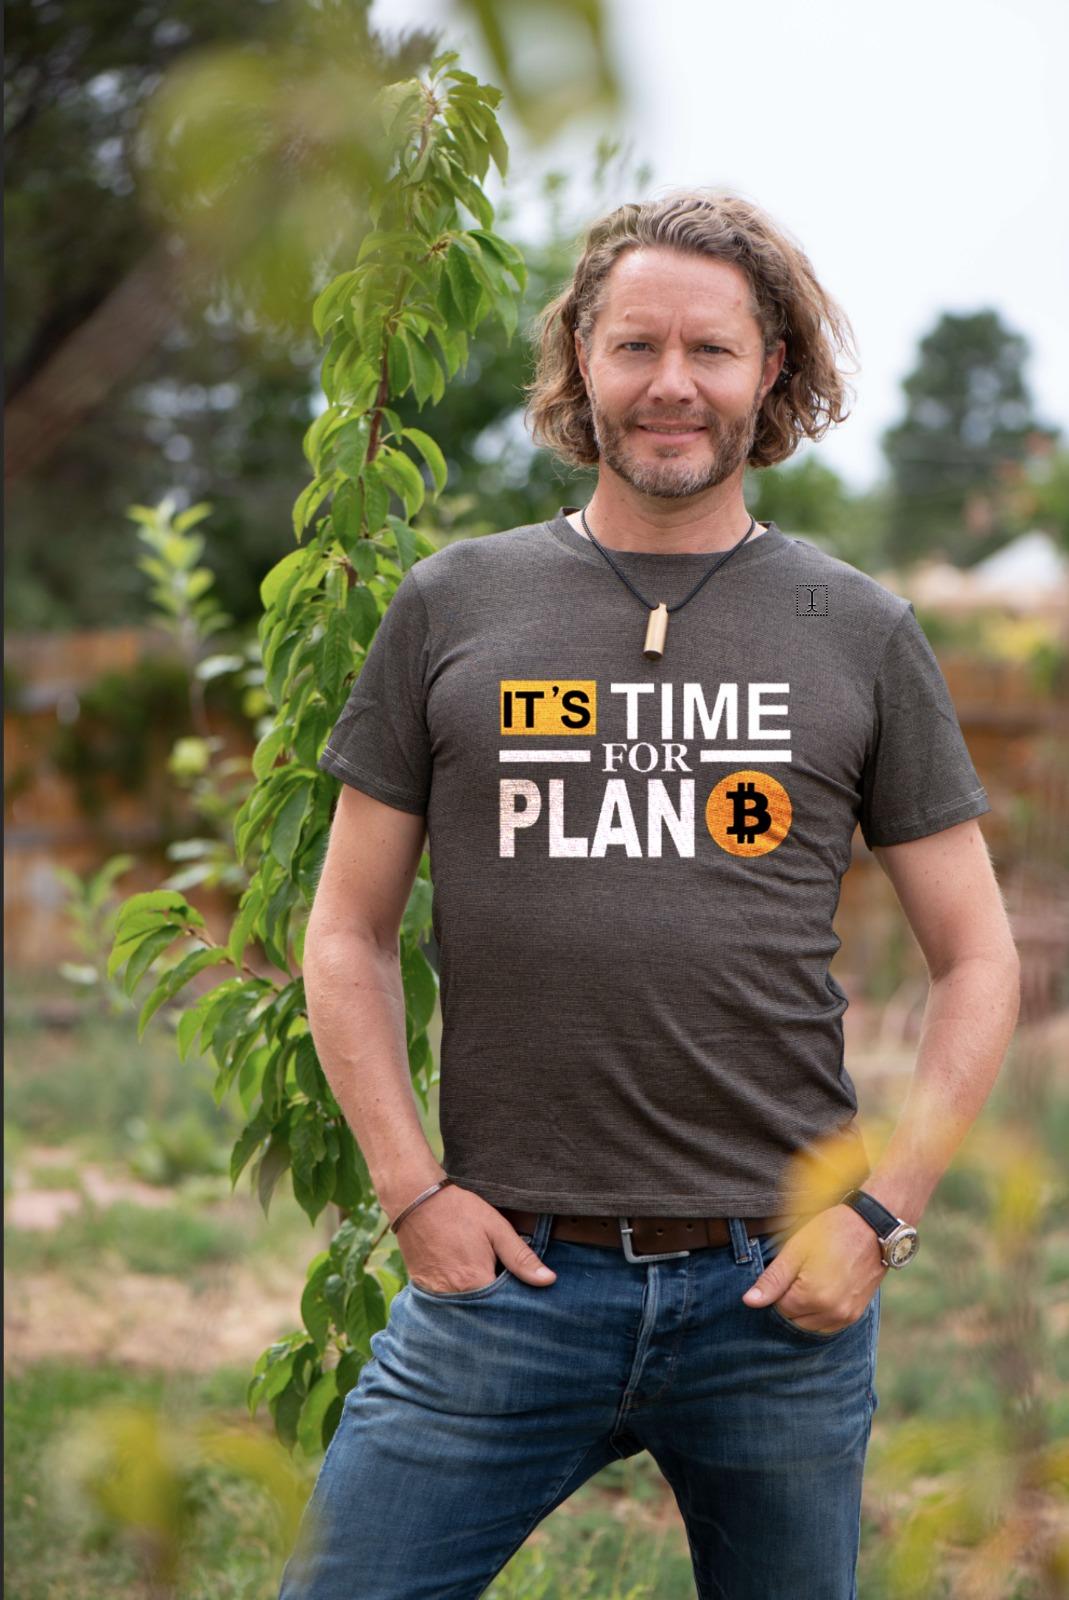 It's Time For Plan B: Leela Quantum Tech Reveals Bitcoin Edition Protective T-Shirt